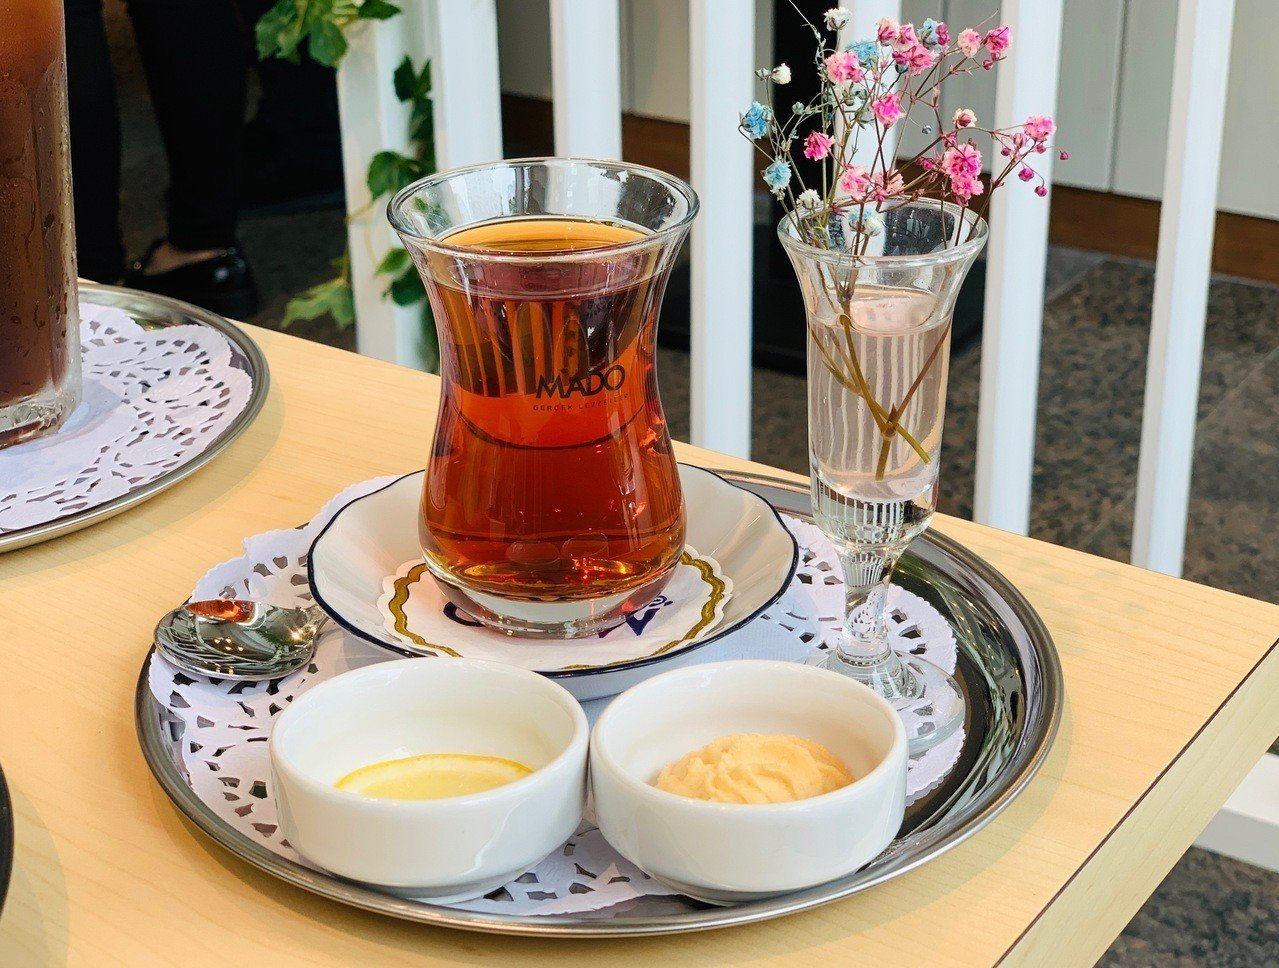 MADO土耳其特色茶飲。記者張芳瑜/攝影